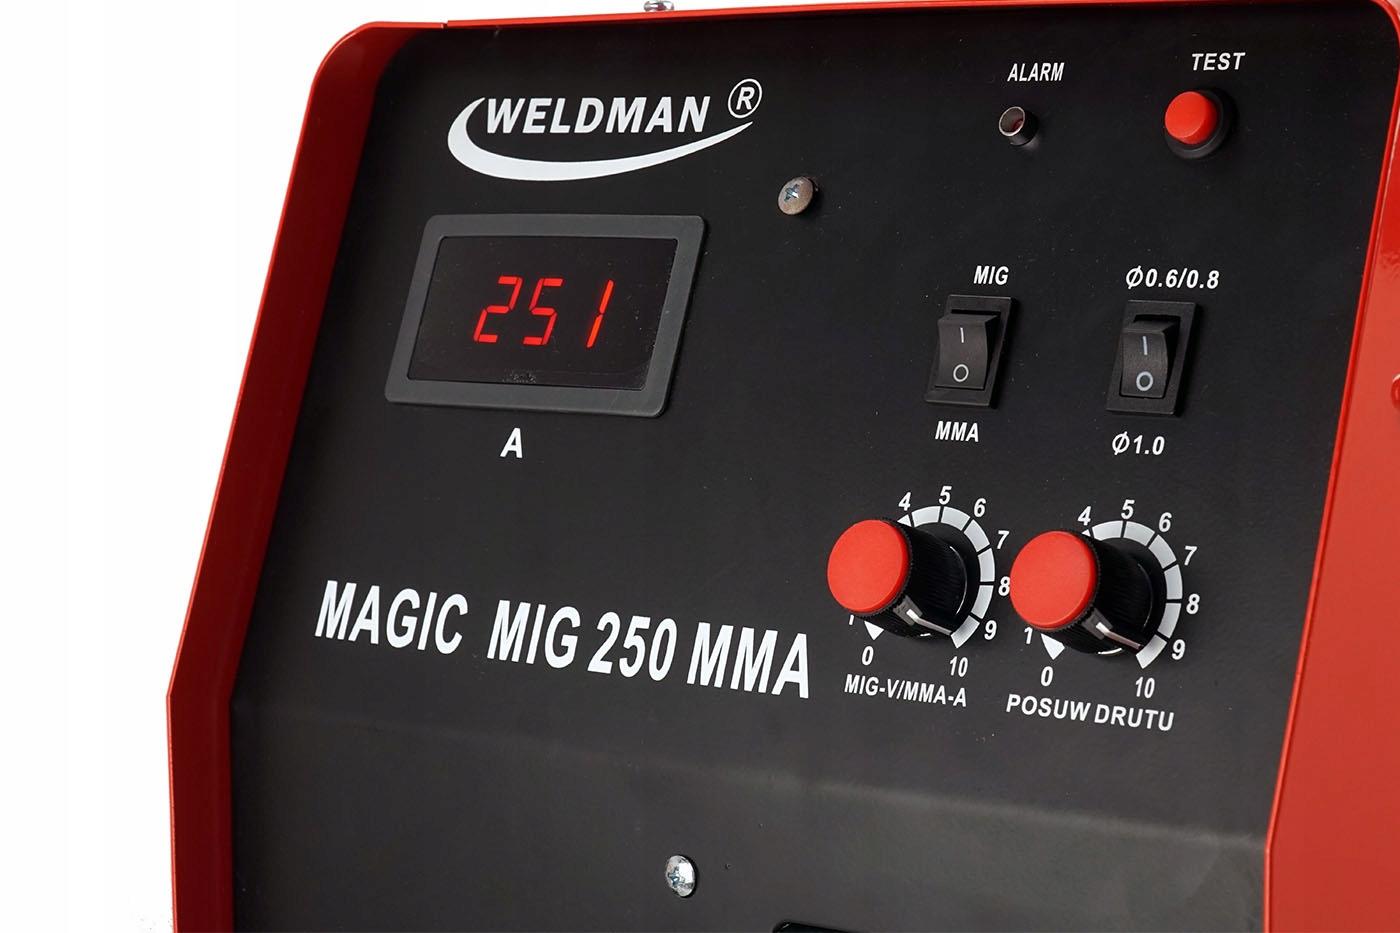 Spawarka MIGOMAT 2w1 Weldman MIG 200 MMA 4x4 Kod producenta Weldman MAGIC MIG 250 XRS6